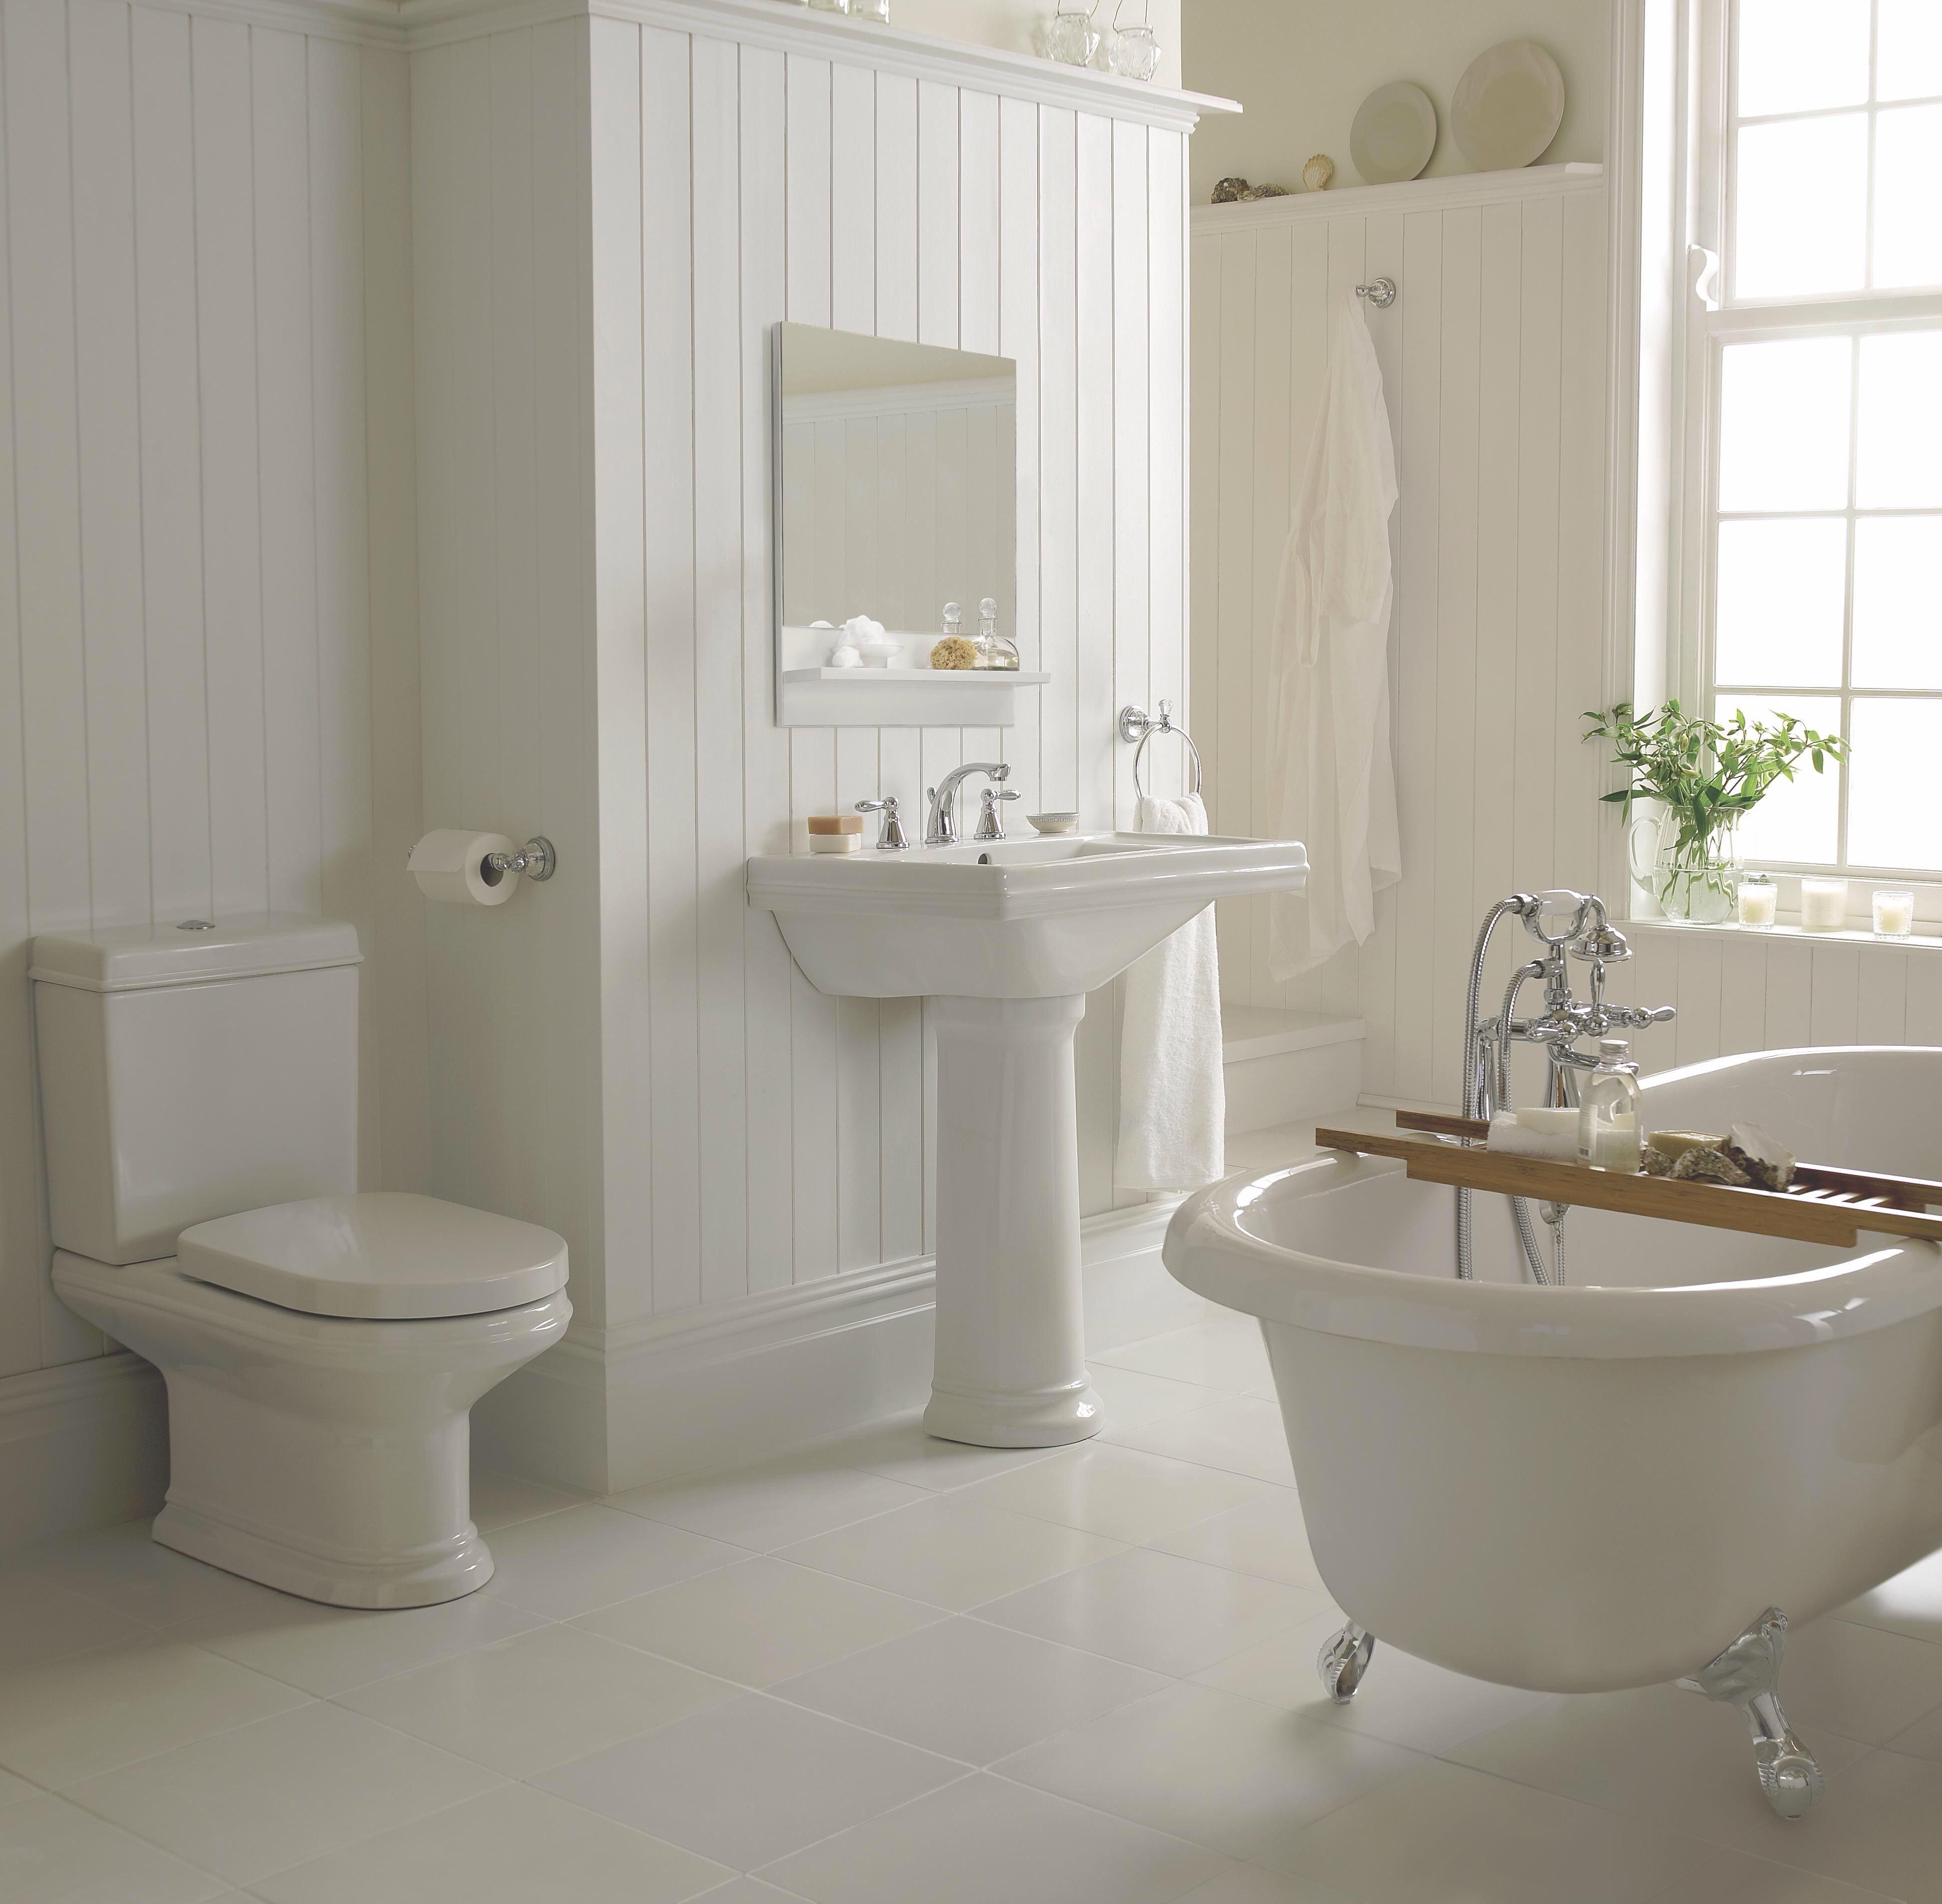 Victorian Inspired Bathroom Style Victorian Bathroom Victorian Style Bathroom Bathroom Style